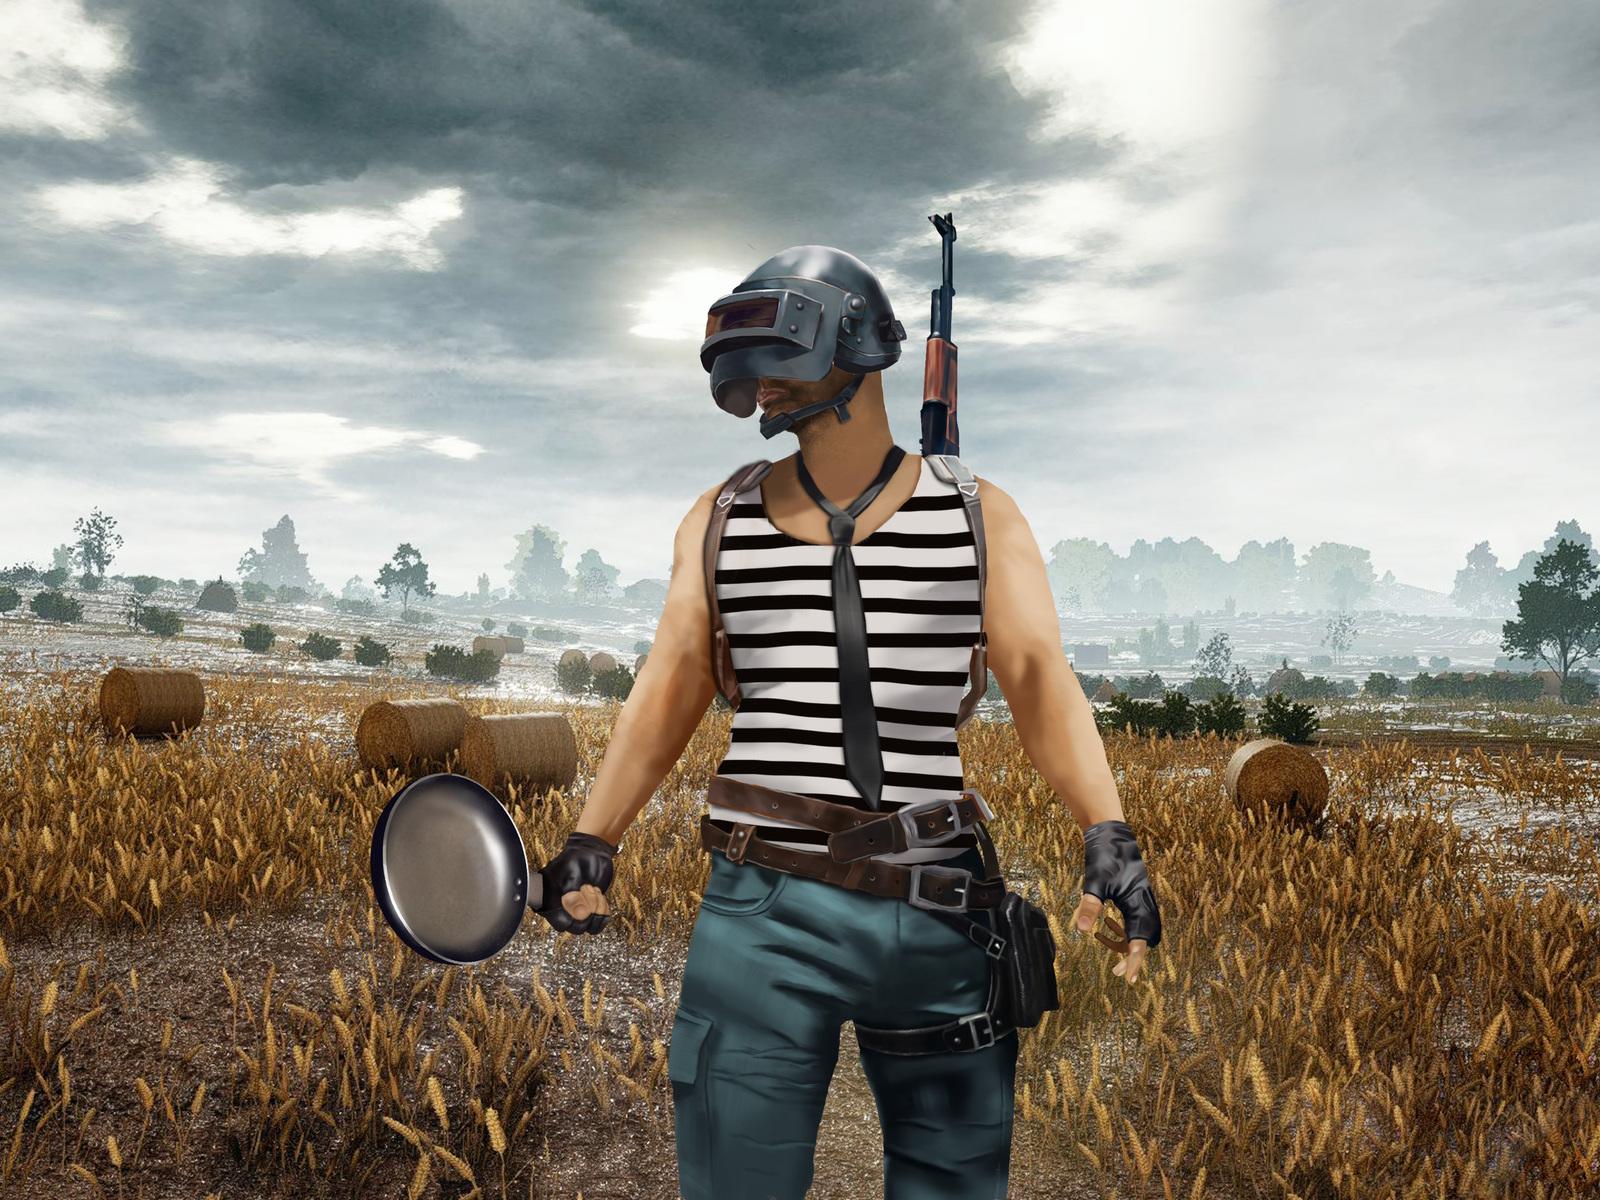 pubg-helmet-and-pan-player-bl.jpg